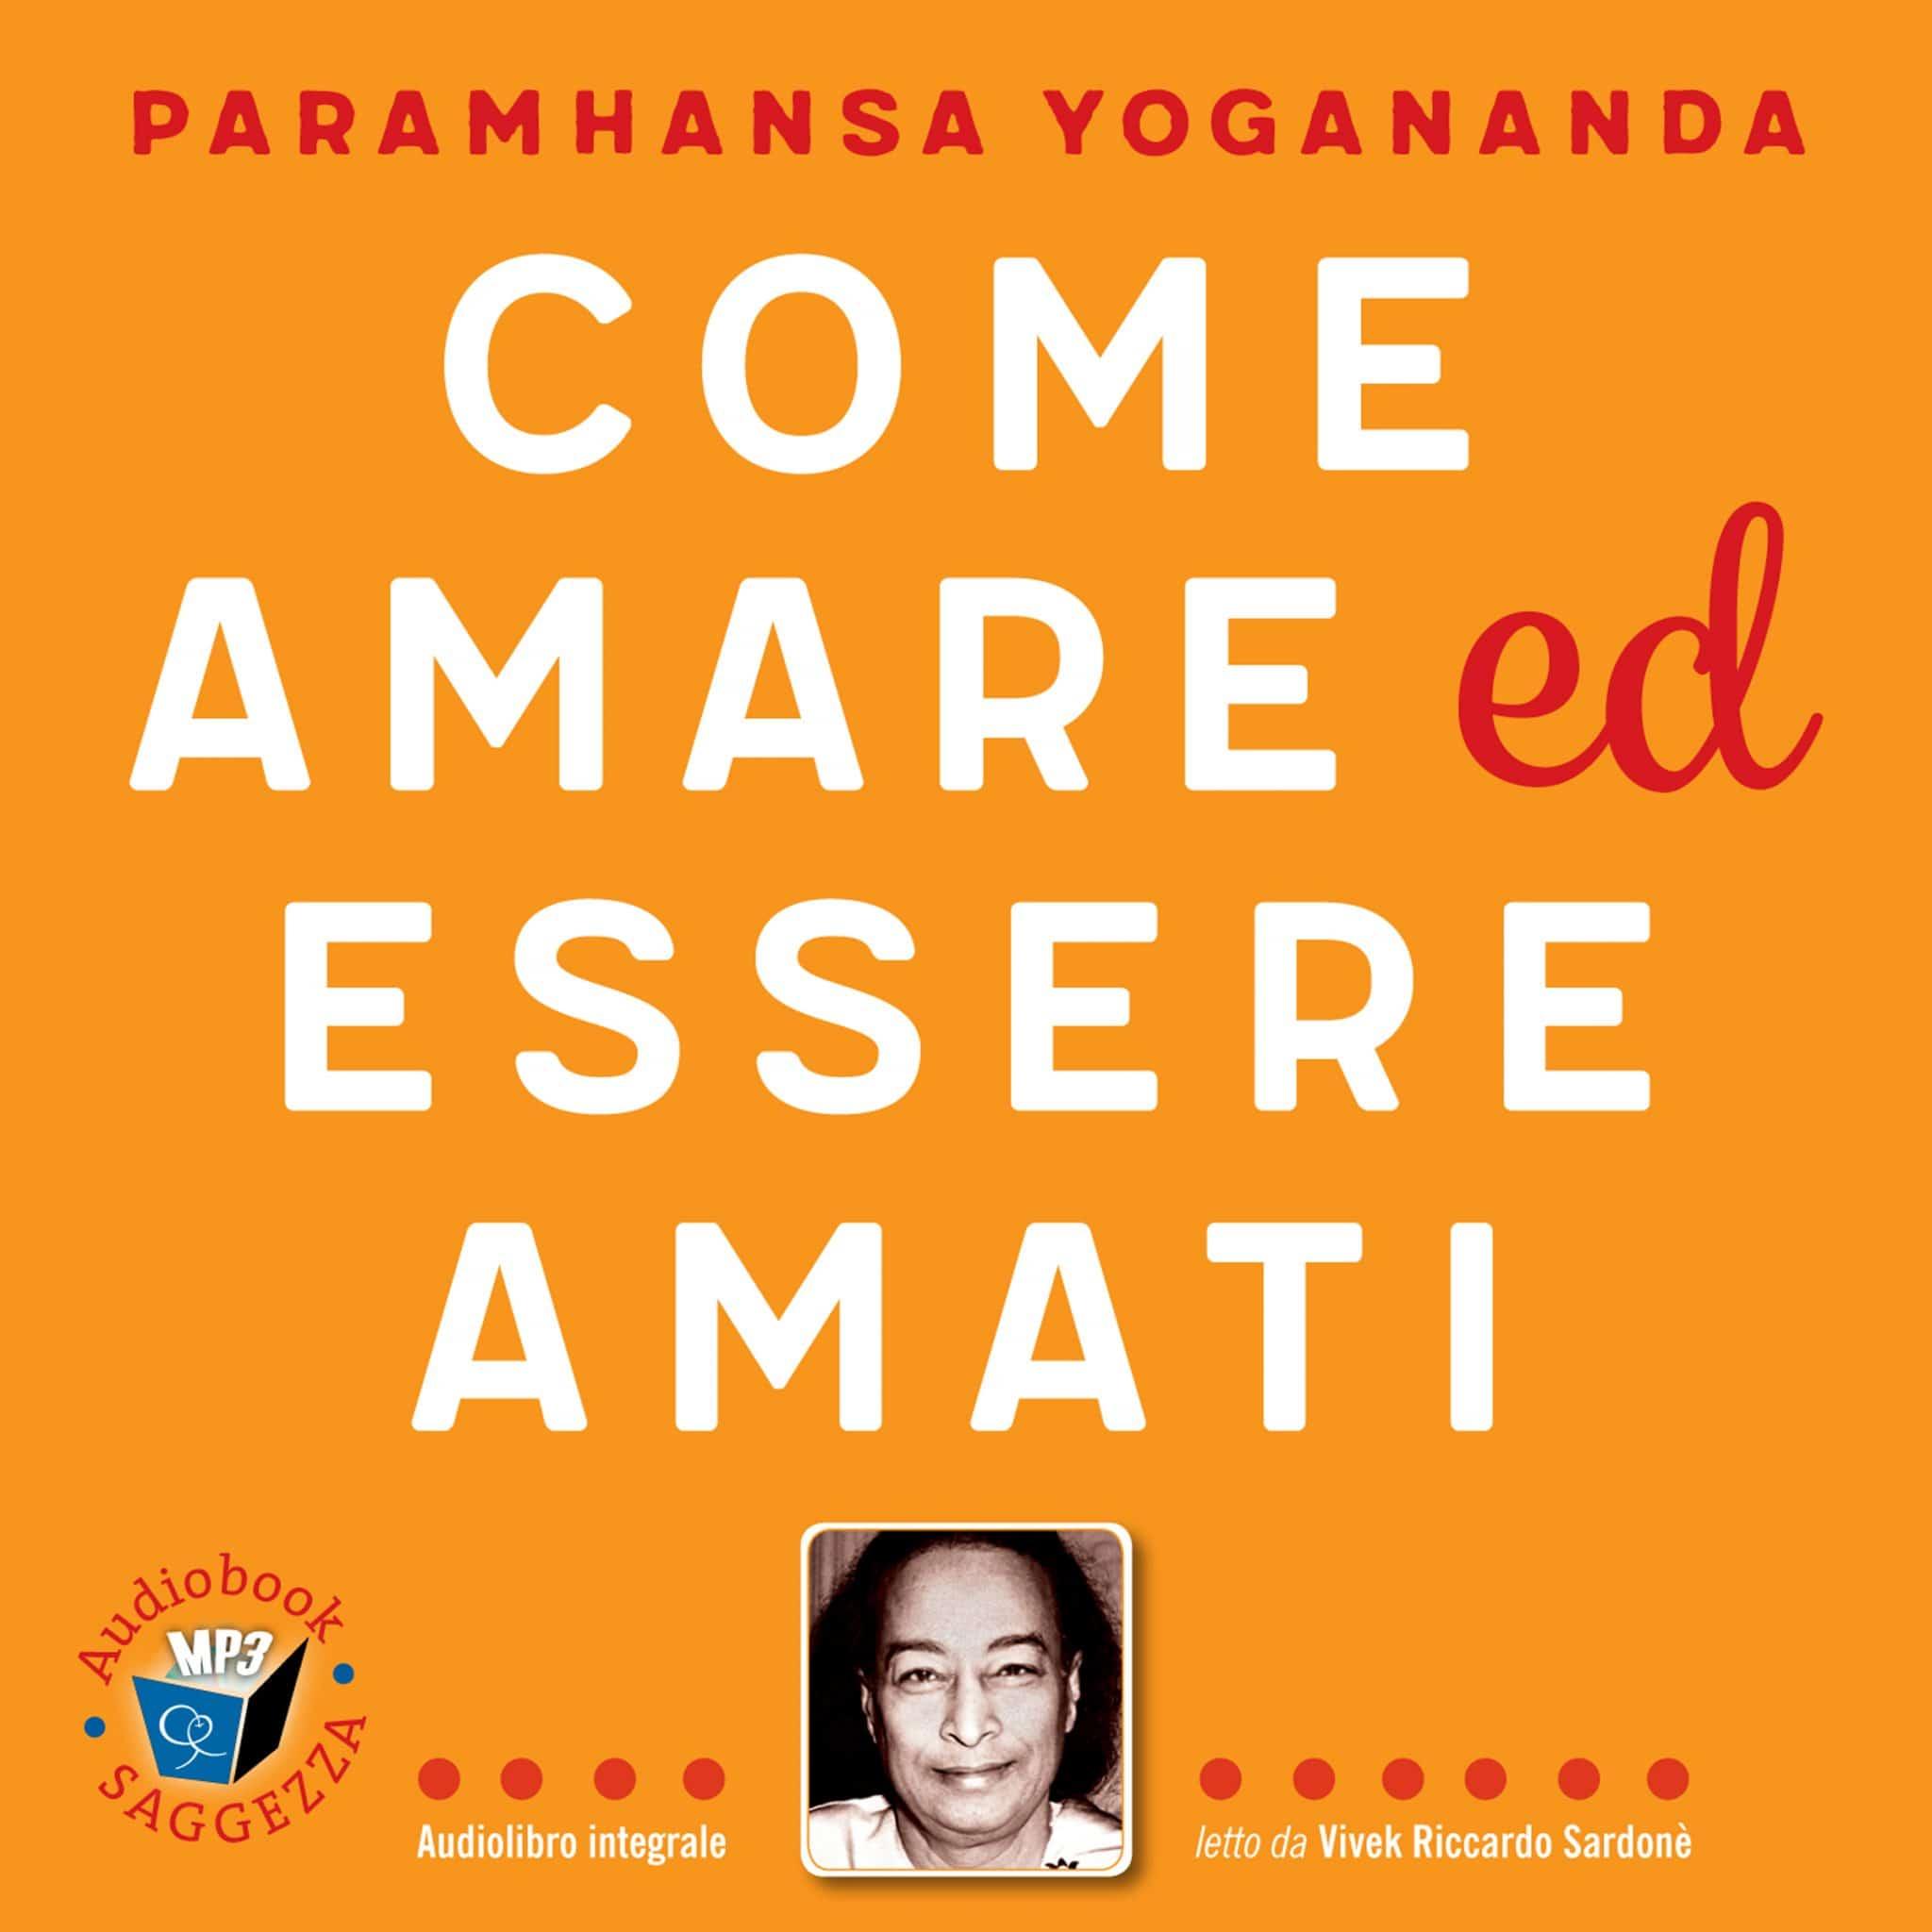 Cover-ComeAmareedEssereAmati